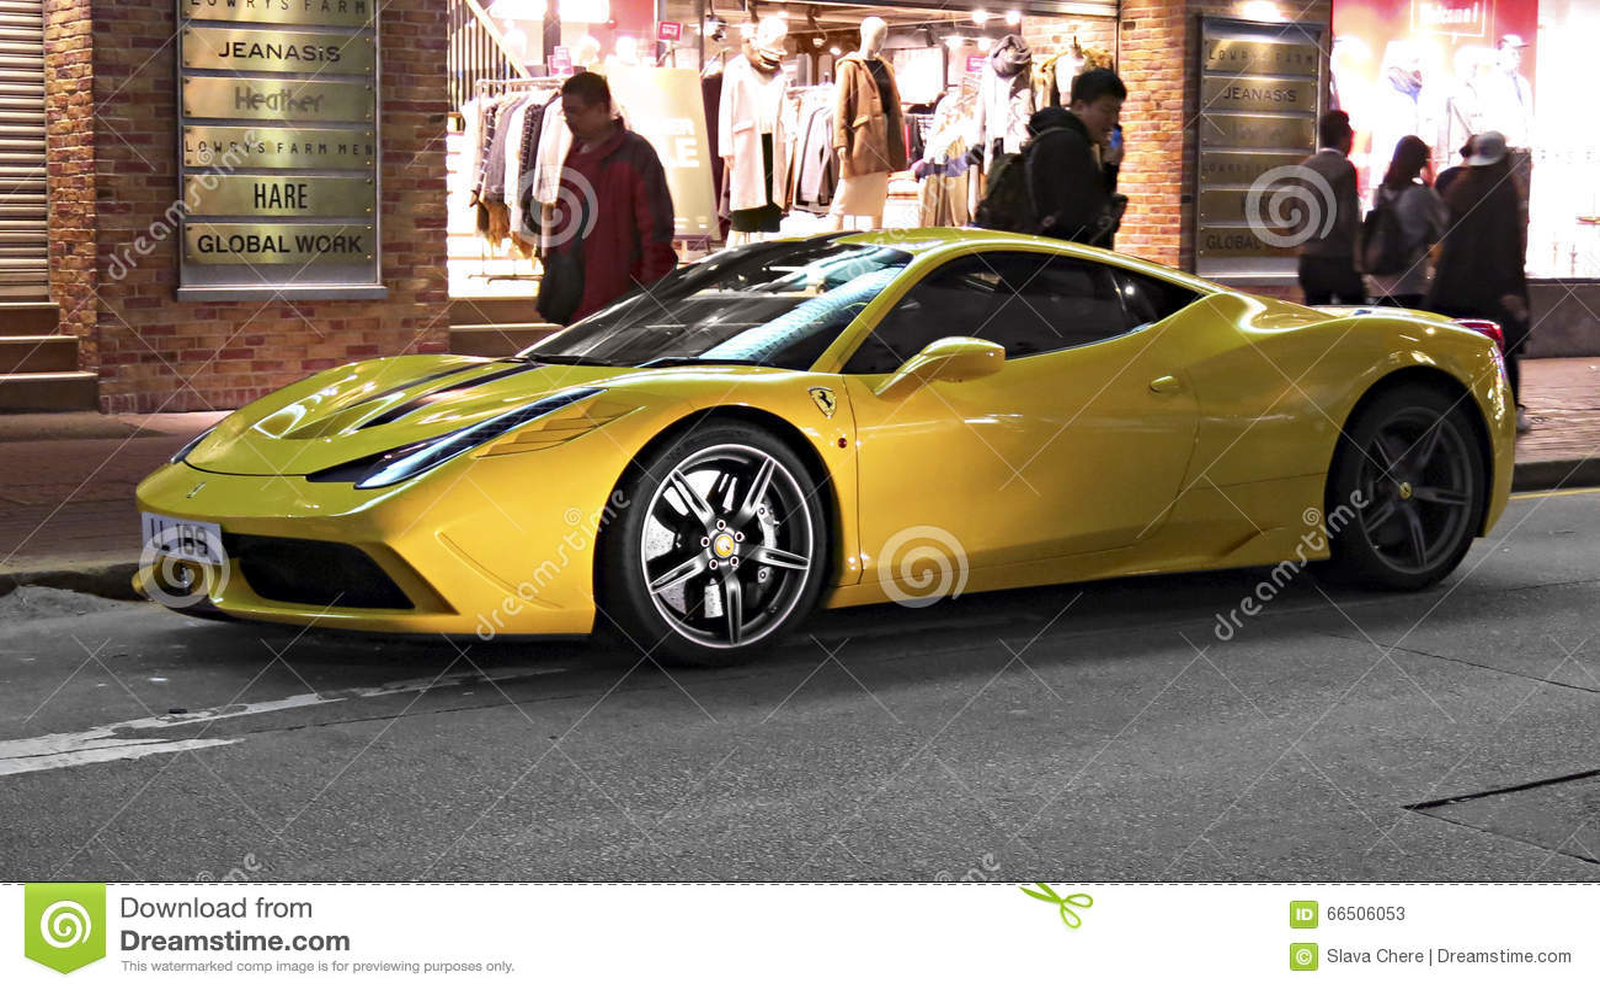 Sports Car Ferrari Editorial Stock Photo Image Of Evening 66506053